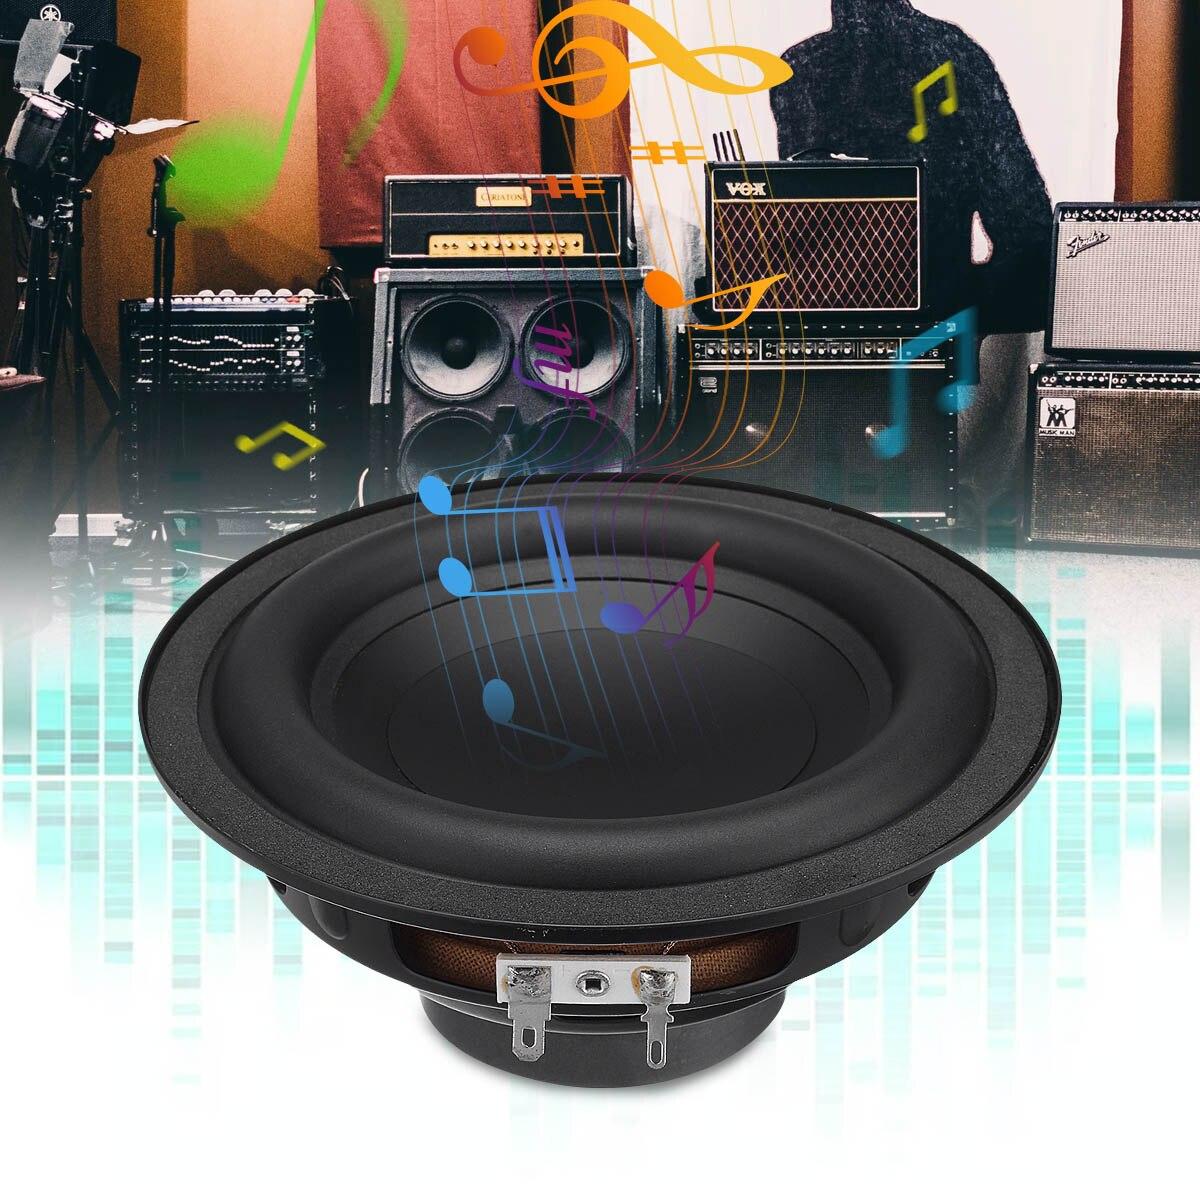 1Pcs 50W 6 Inch DIY Sound Box Loudspeaker Stereo Subwoofer Strong Bass Horn Clear Voice Speaker Trumpet Car Boat Amplify Speaker